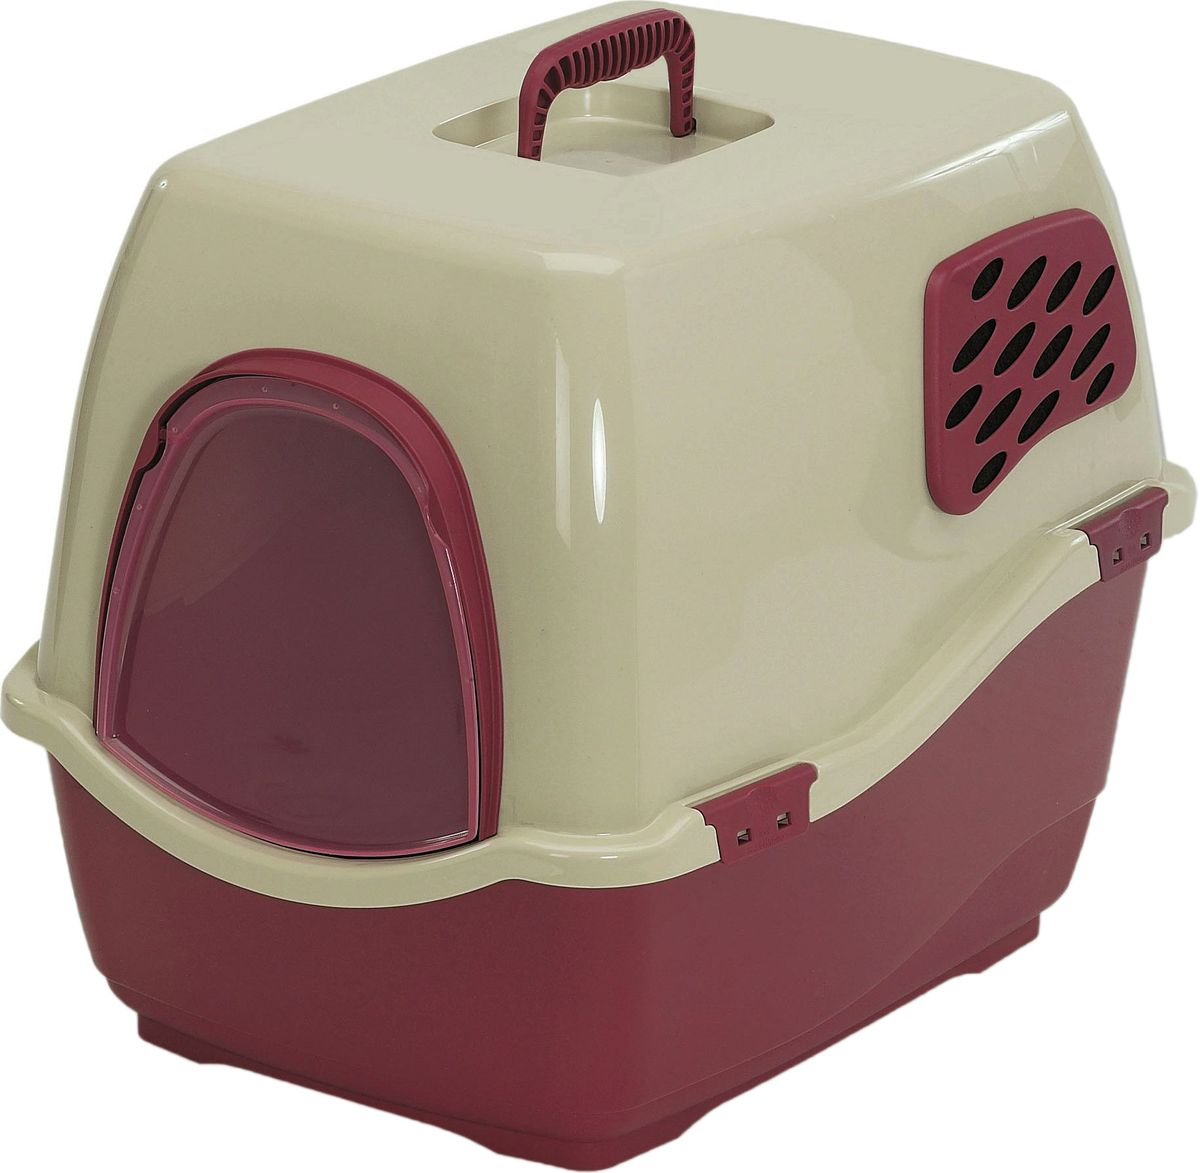 Био-туалет для животных Marchioro Bill 1F, цвет: коричневый, бежевый, 50 х 40 х 42 см переноска marchioro skipper 1f цвет малиновый бежевый 48 х 32 х 31 см с металлической дверцей